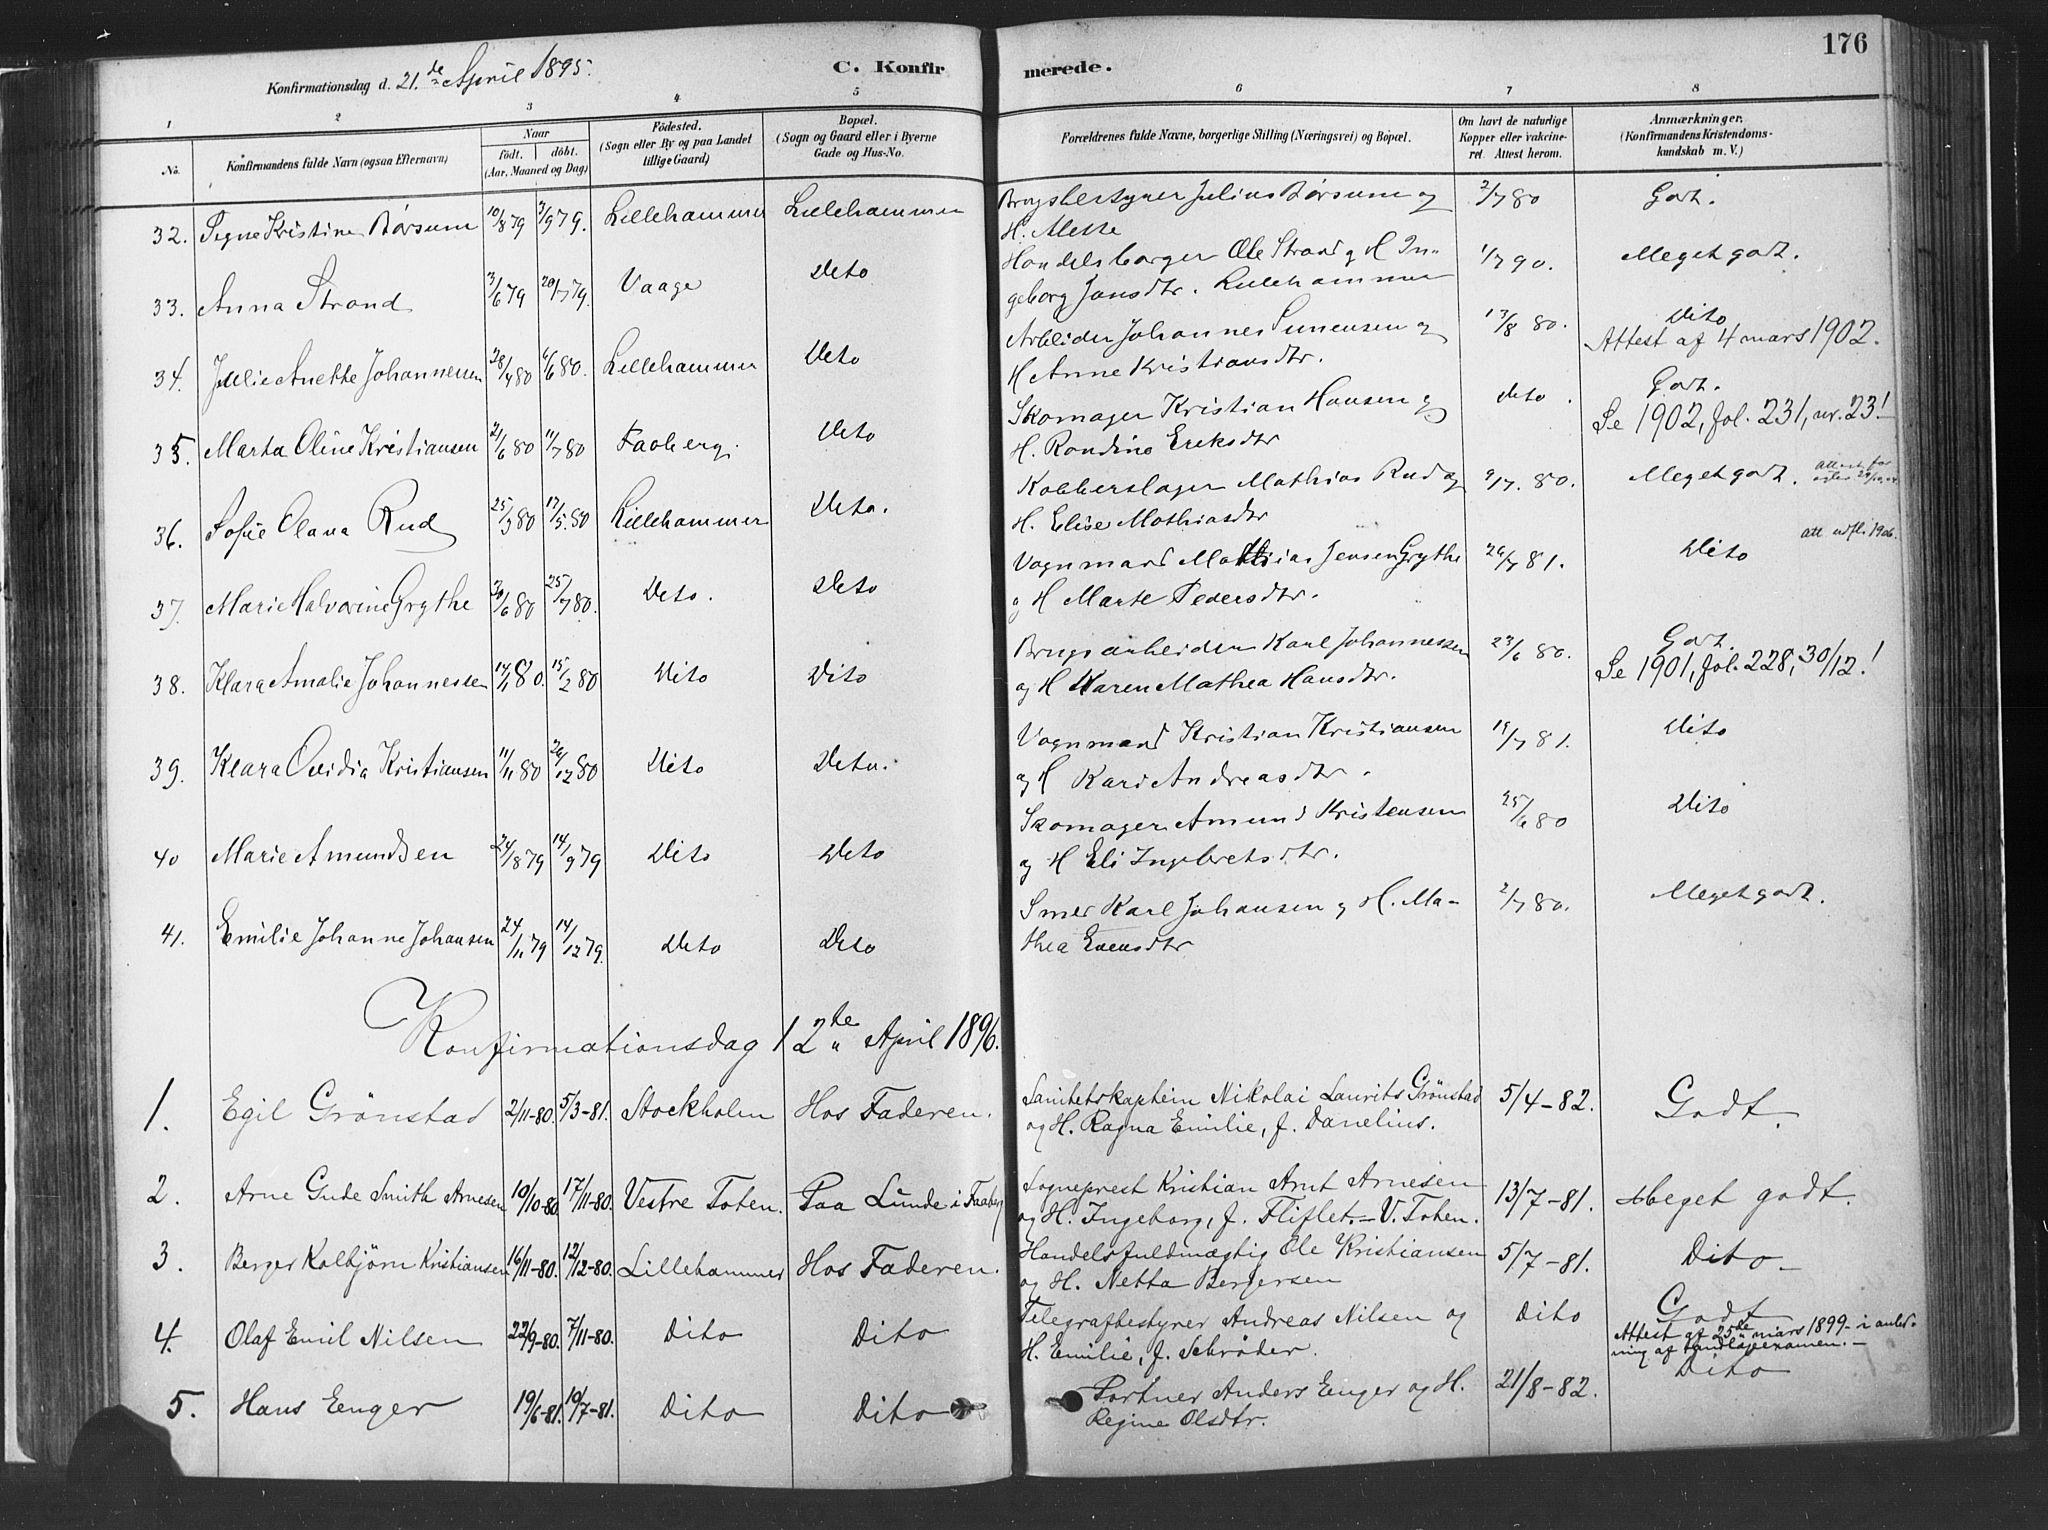 SAH, Fåberg prestekontor, H/Ha/Haa/L0010: Parish register (official) no. 10, 1879-1900, p. 176